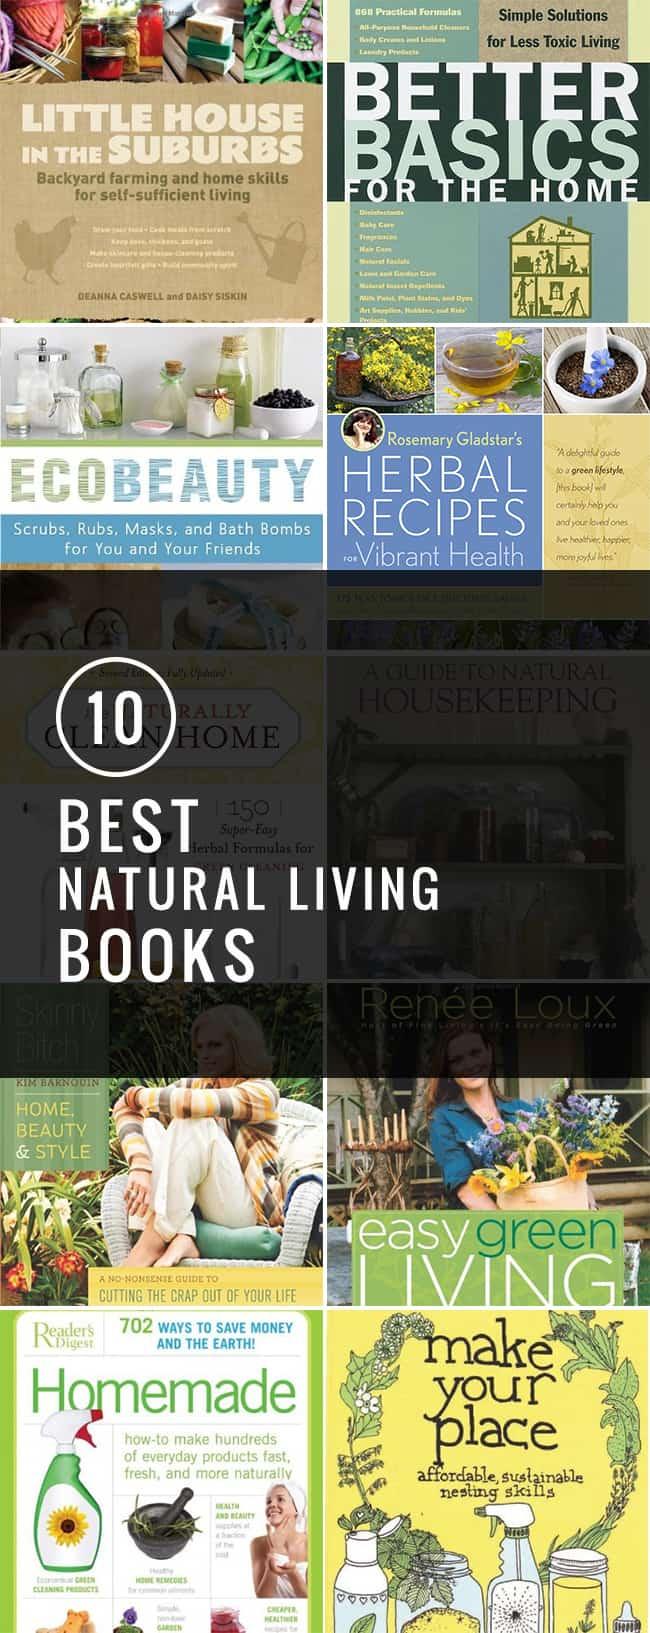 10 Favorite Natural Living Books | Hello Glow